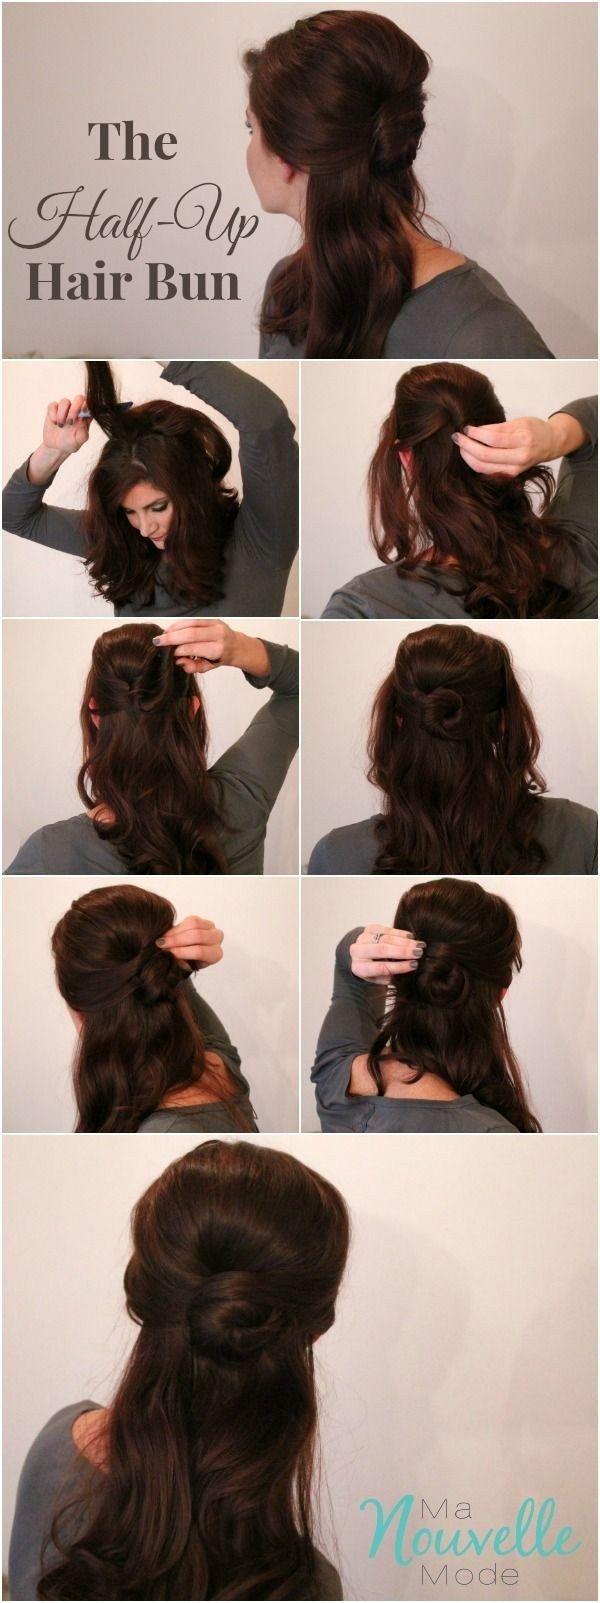 Belle's elegant half-up bun | 7 Easy Hair Tutorials Even Disney Princesses Would Envy